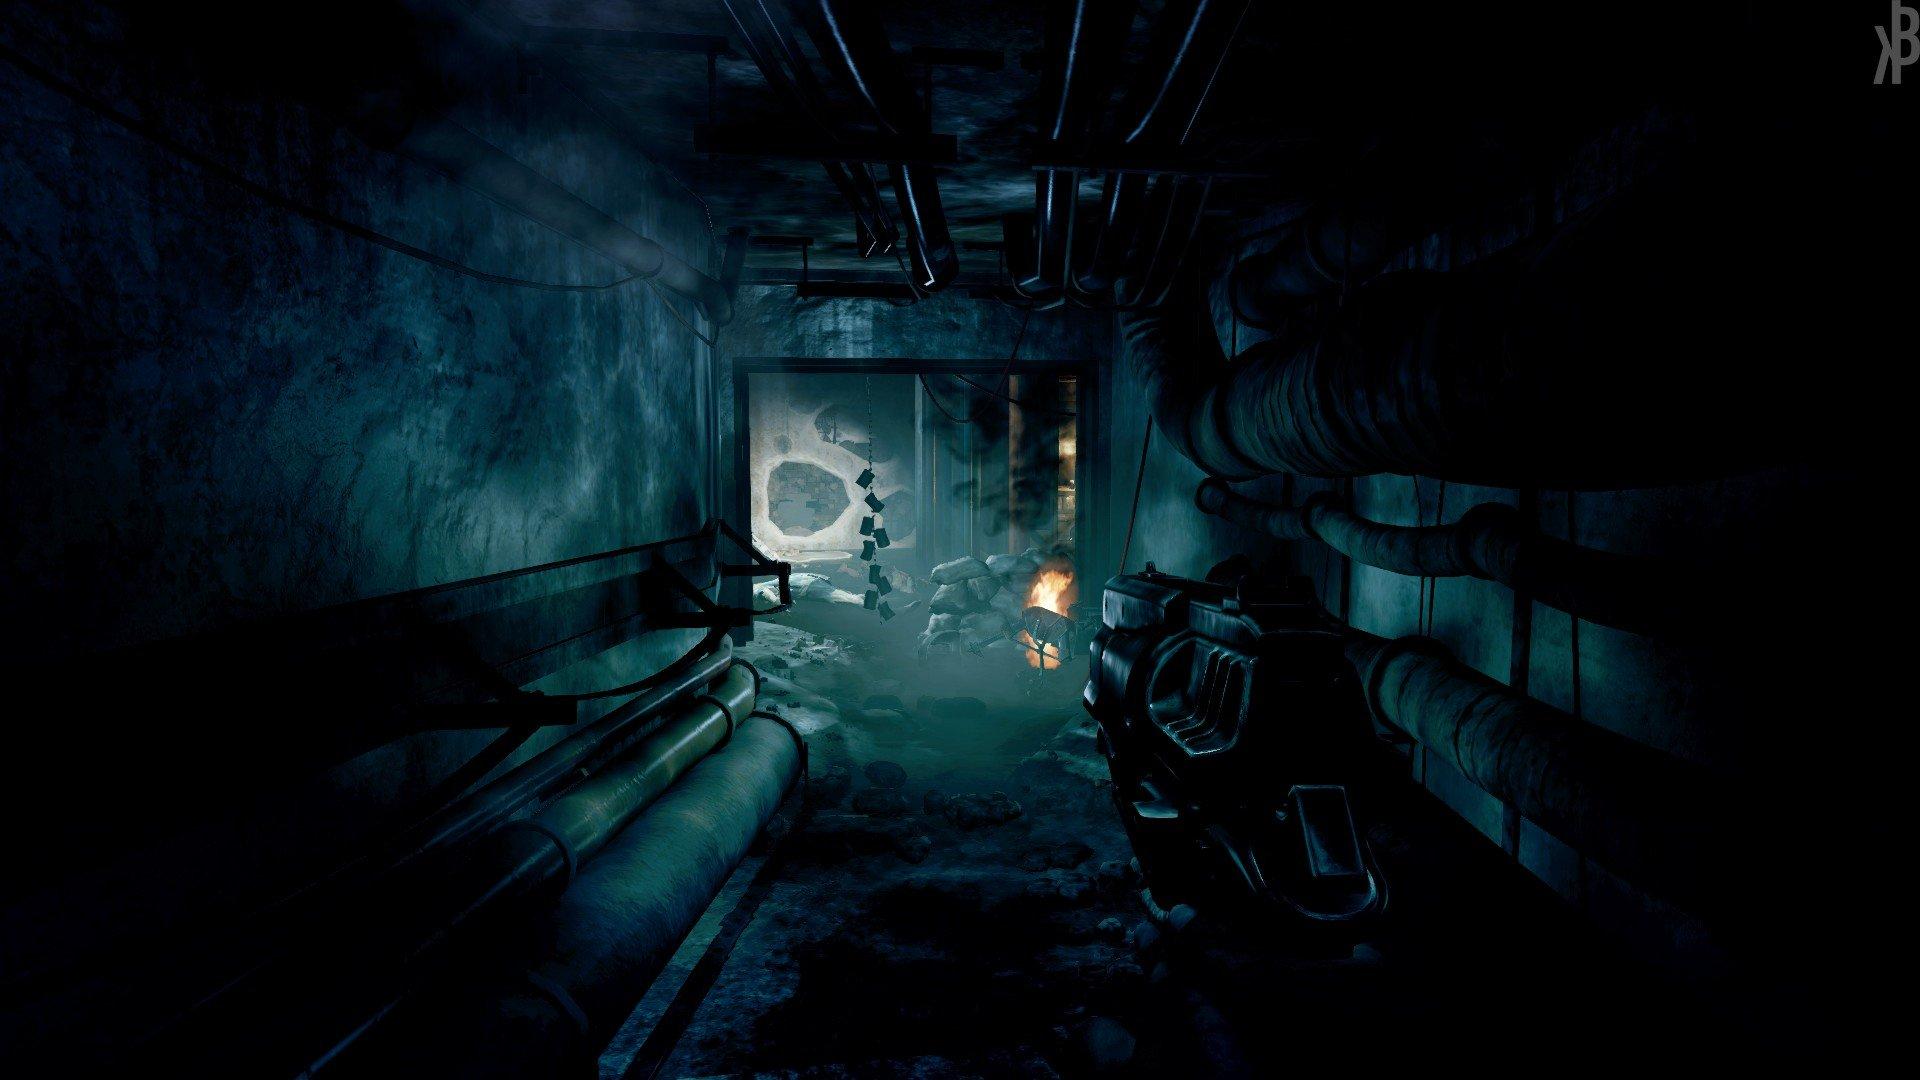 video games, Fallout 4 Wallpaper